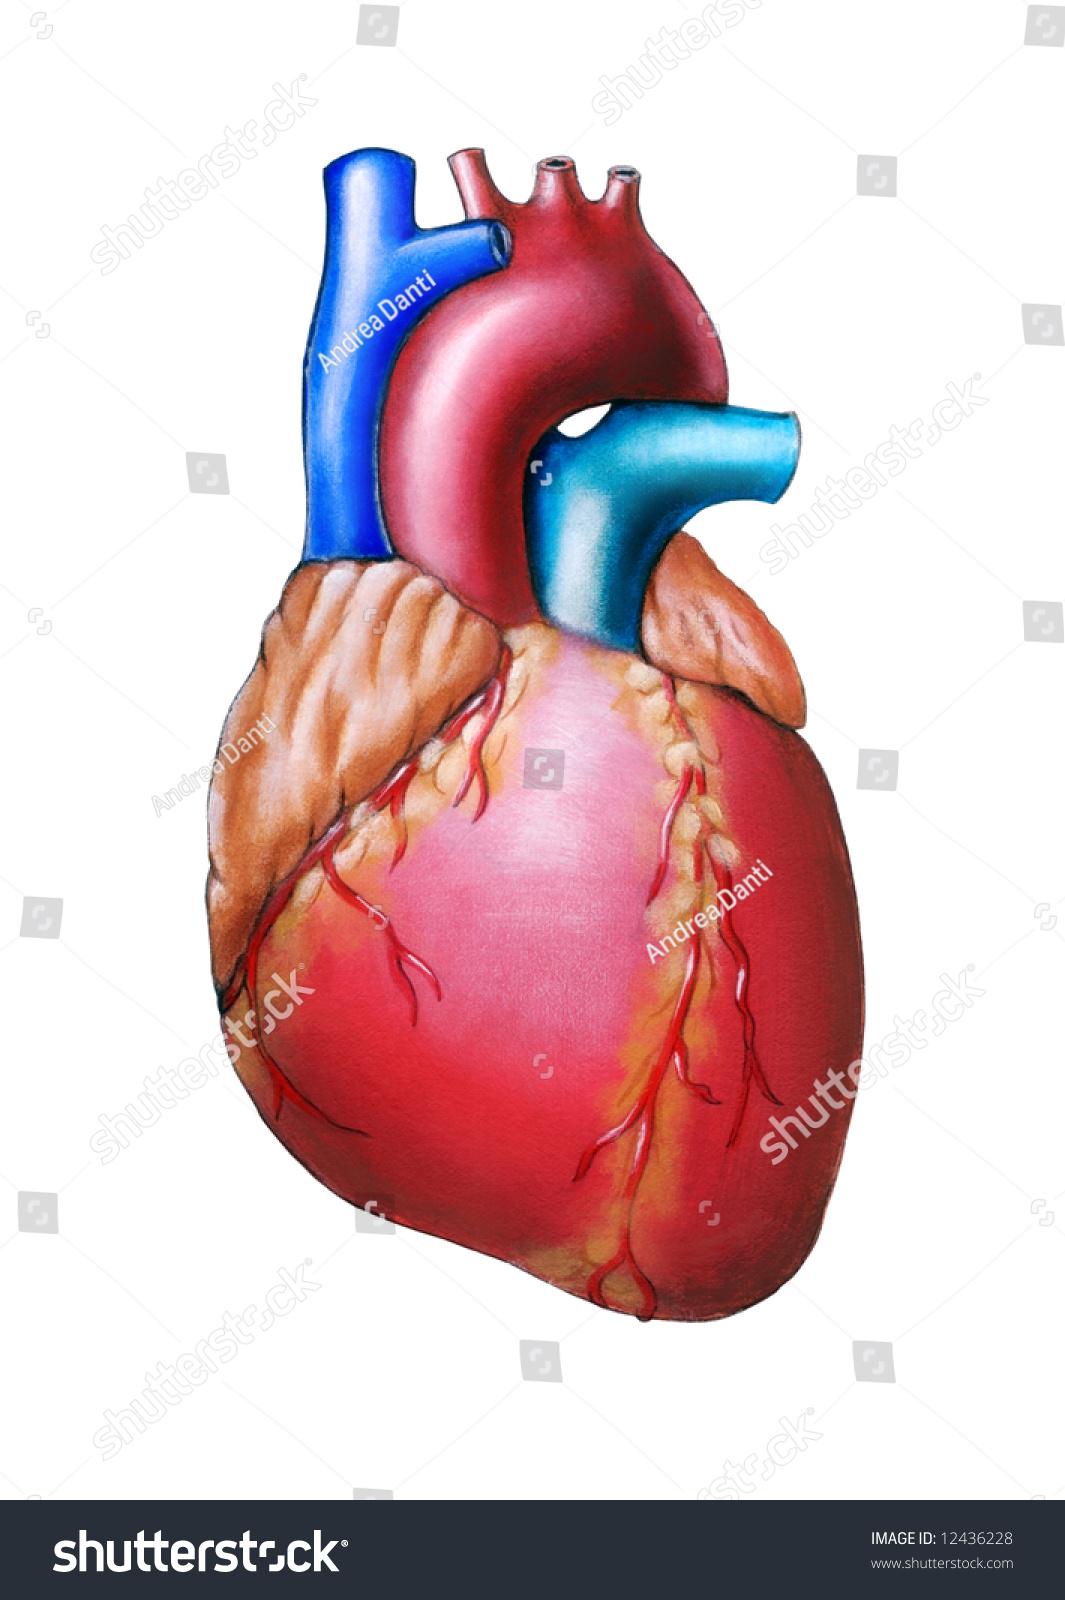 Human Heart Anatomy Original Hand Painted Stock Illustration